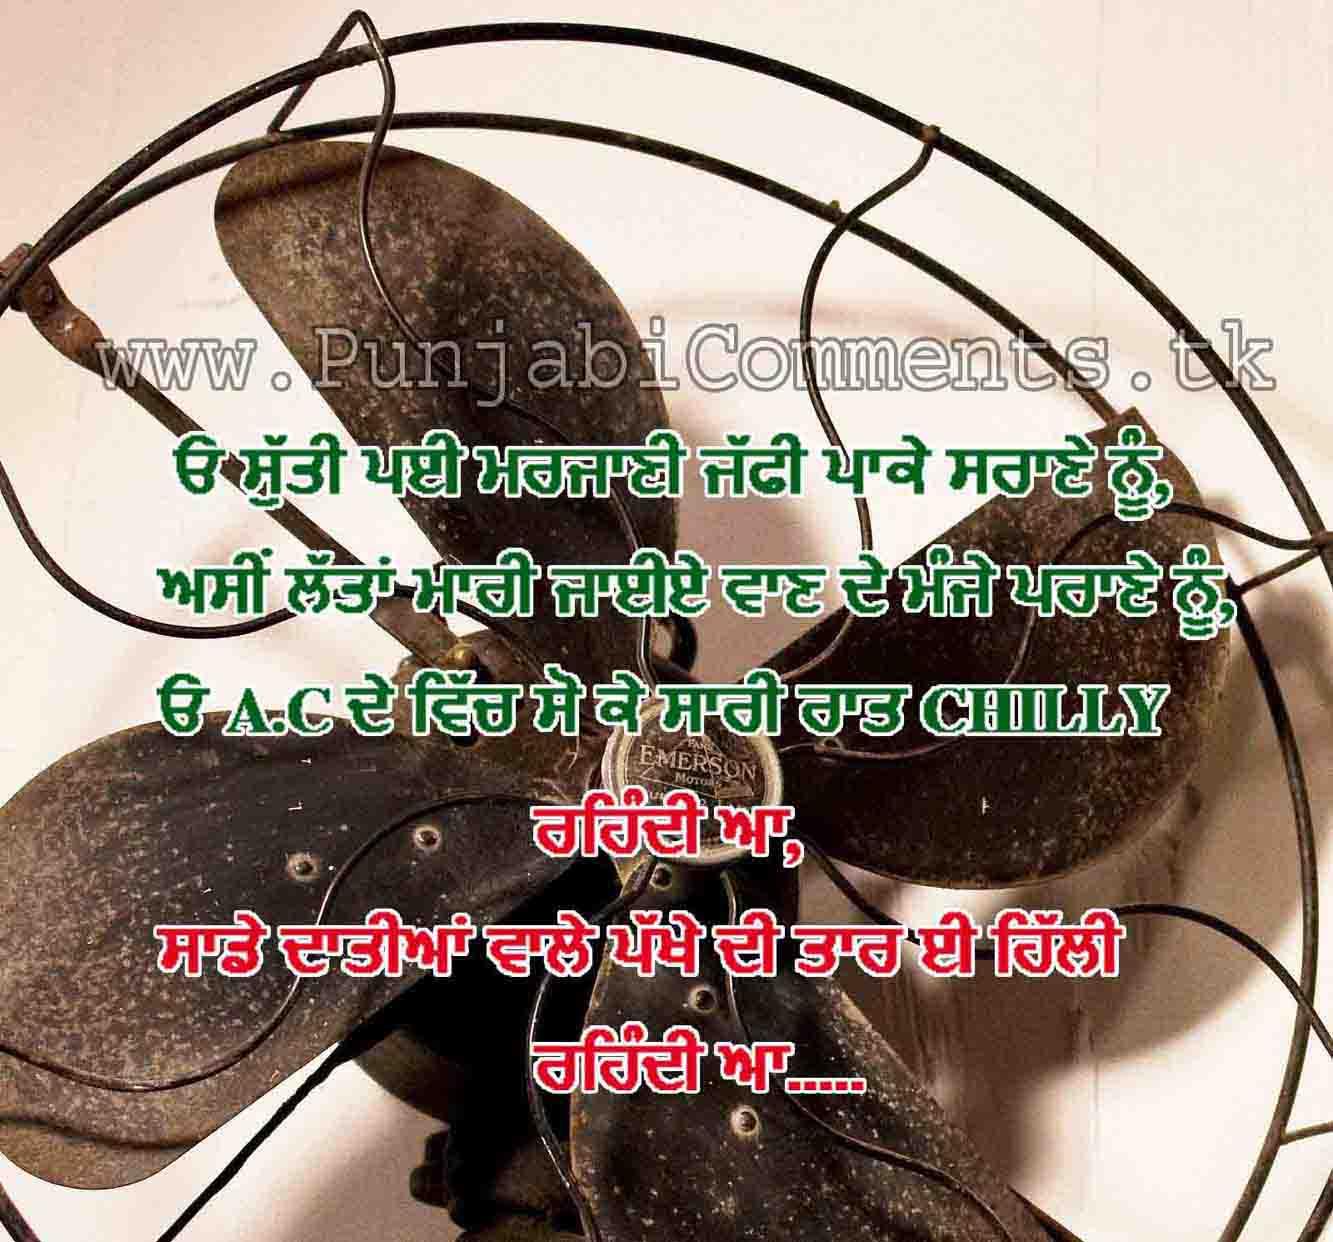 Funny Punjabi Images